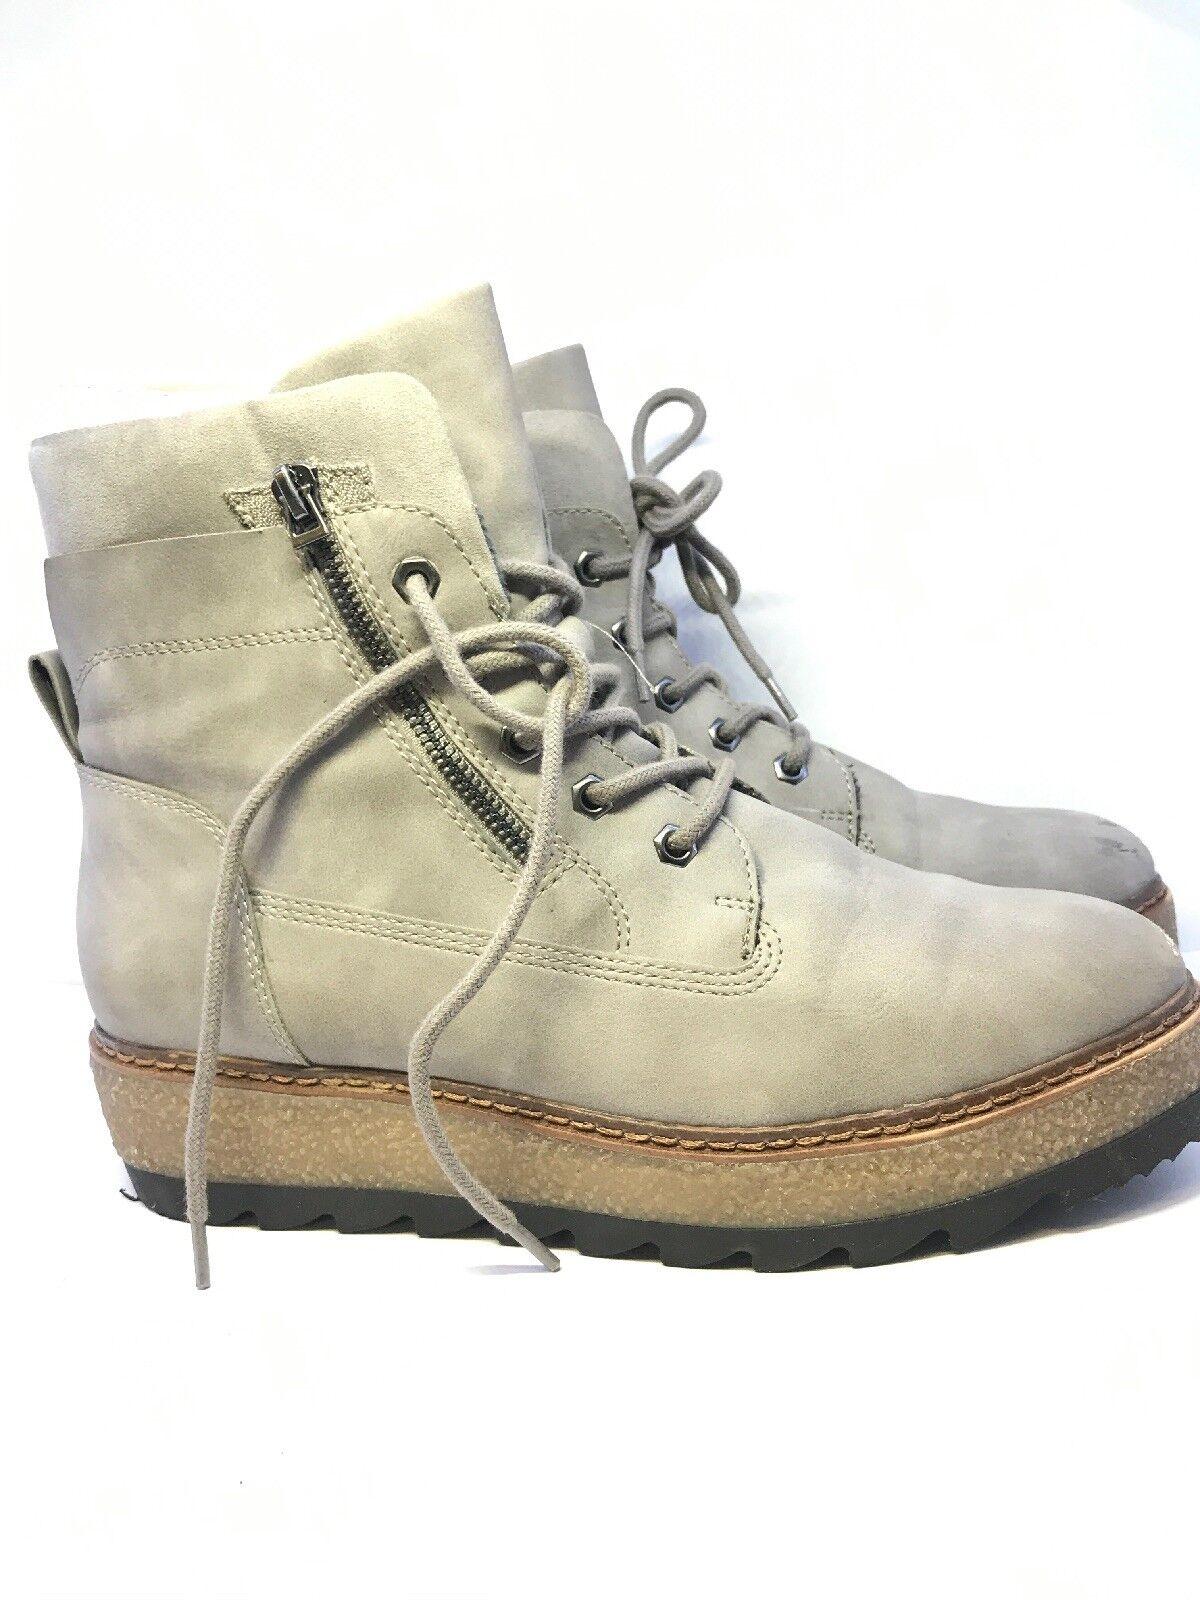 Tamaris Womens Grey Suedette Platform Boots Size